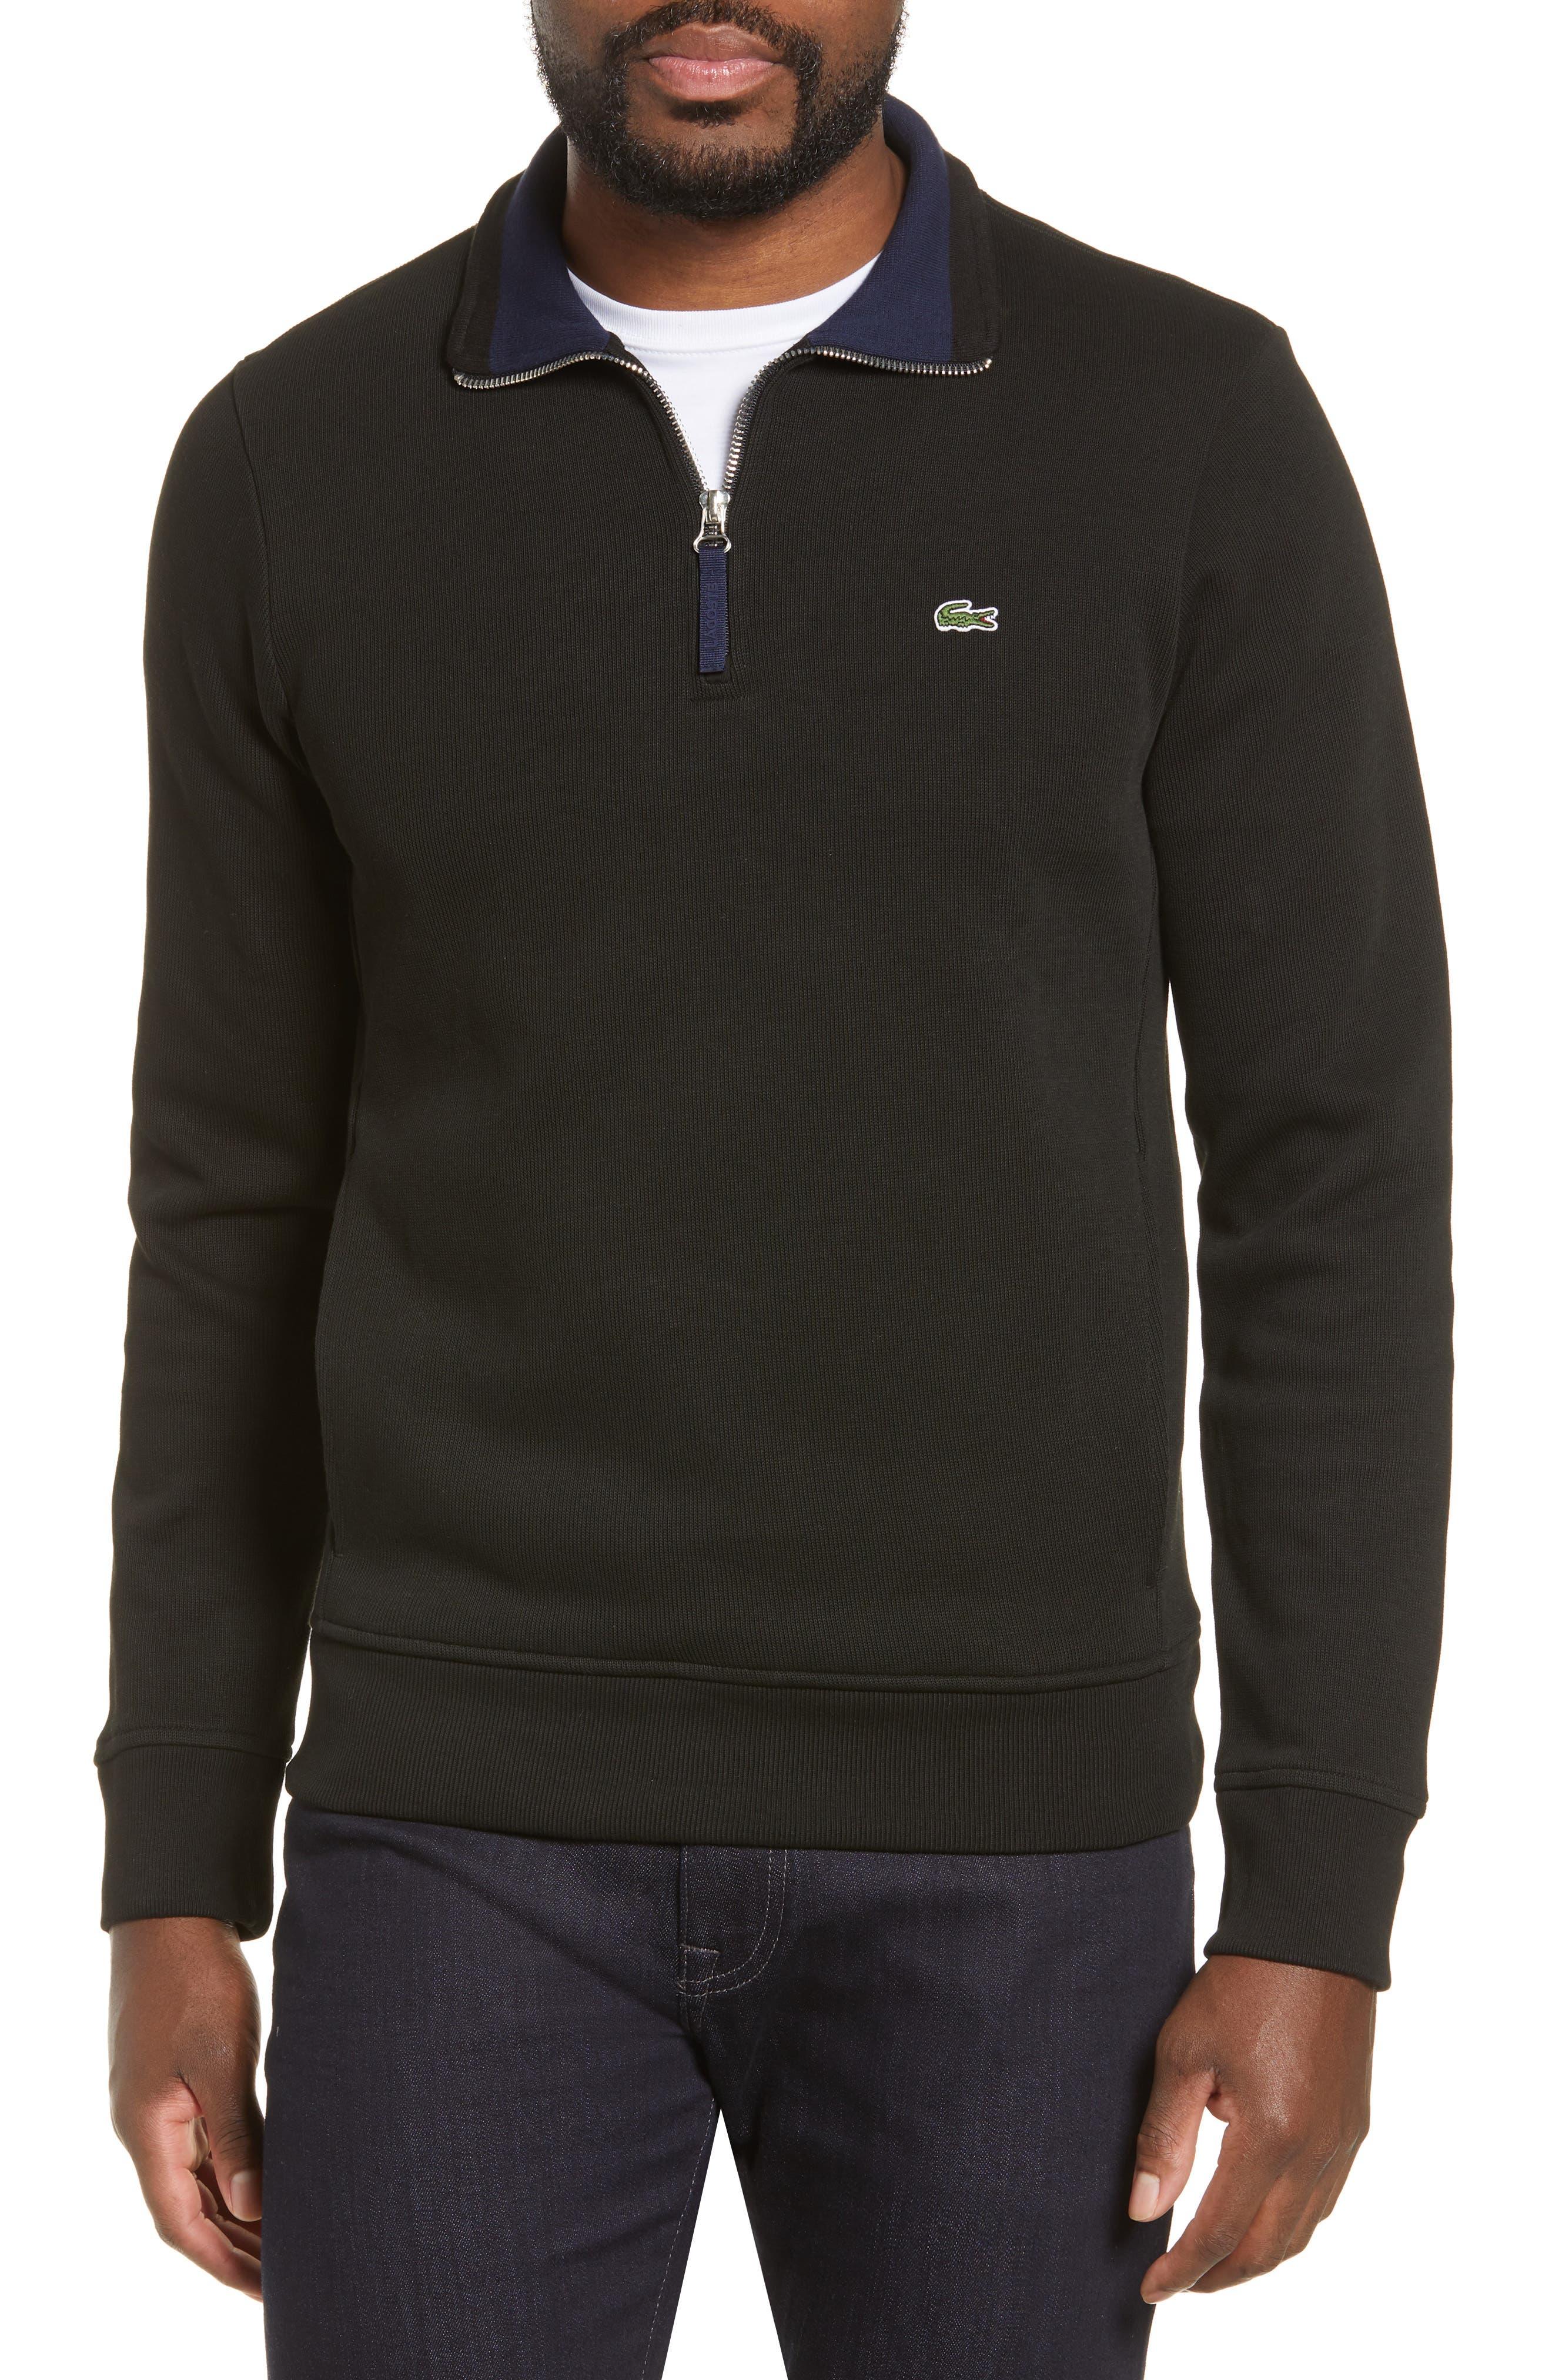 LACOSTE Quarter Zip Pullover, Main, color, BLACK/ NAVY BLUE